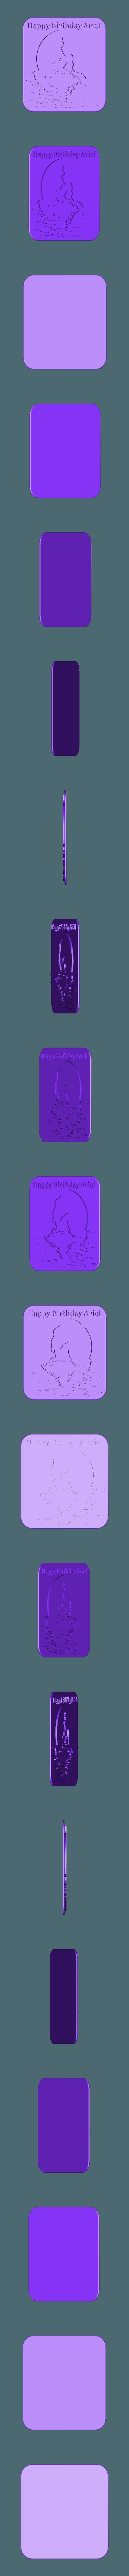 Ariel disney1.STL Download free STL file Disney Ariel • 3D print design, Saeid